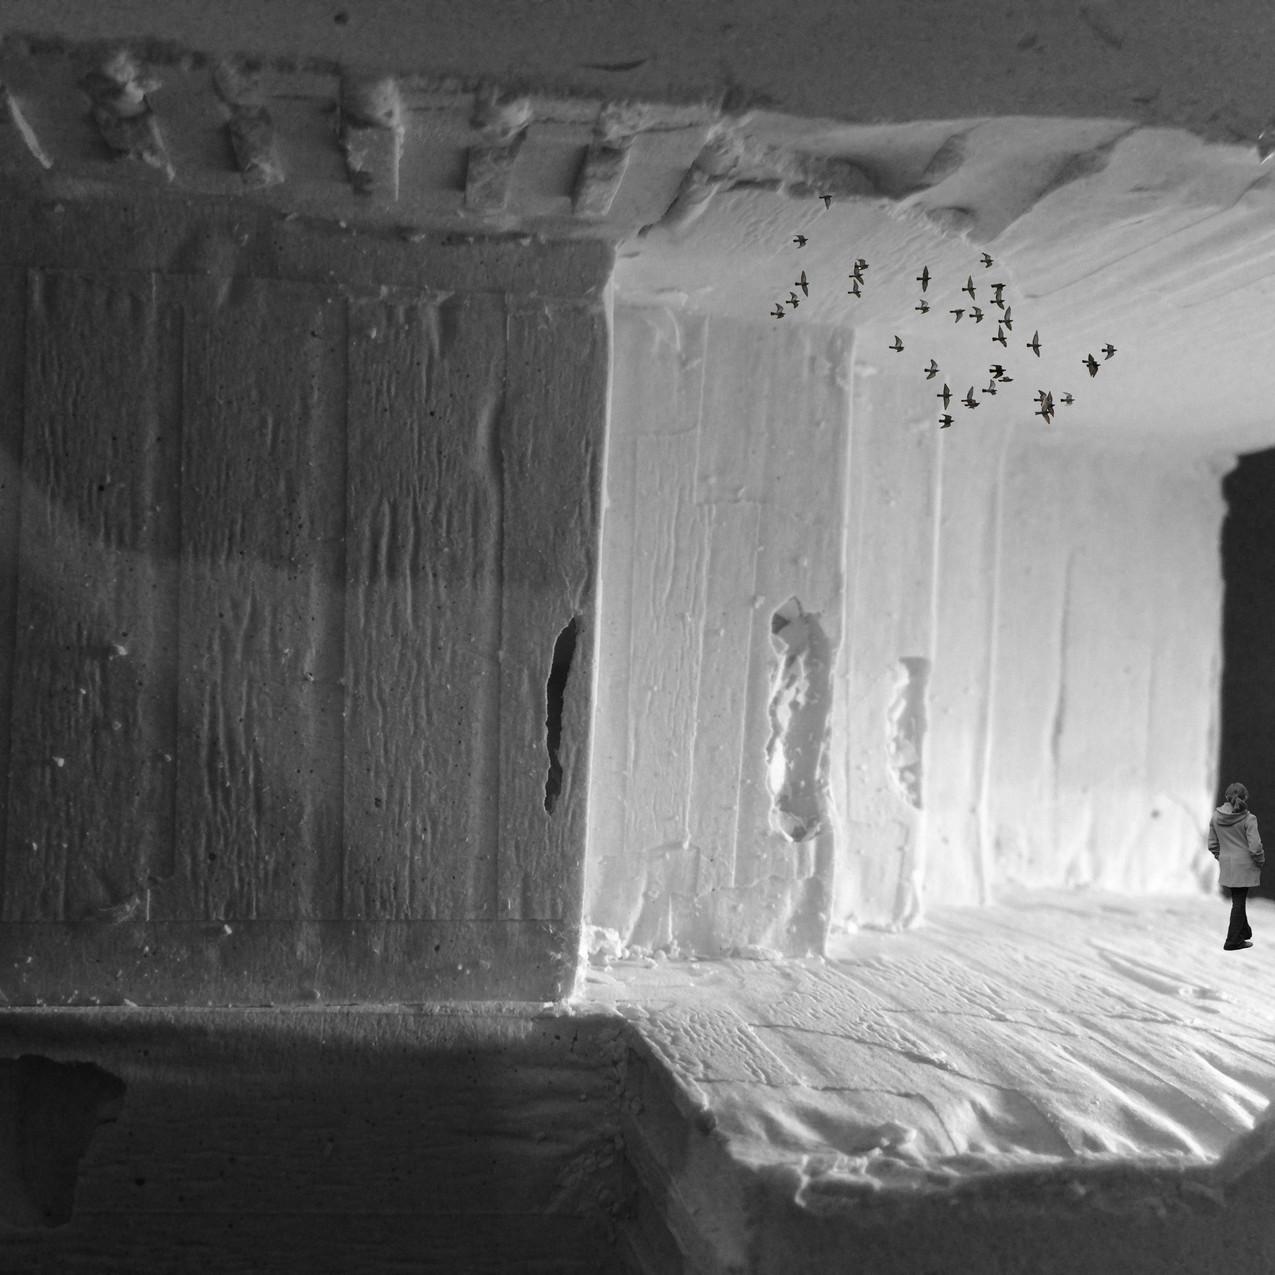 Plaster Cast, Abandonment Marie Ciarleglio